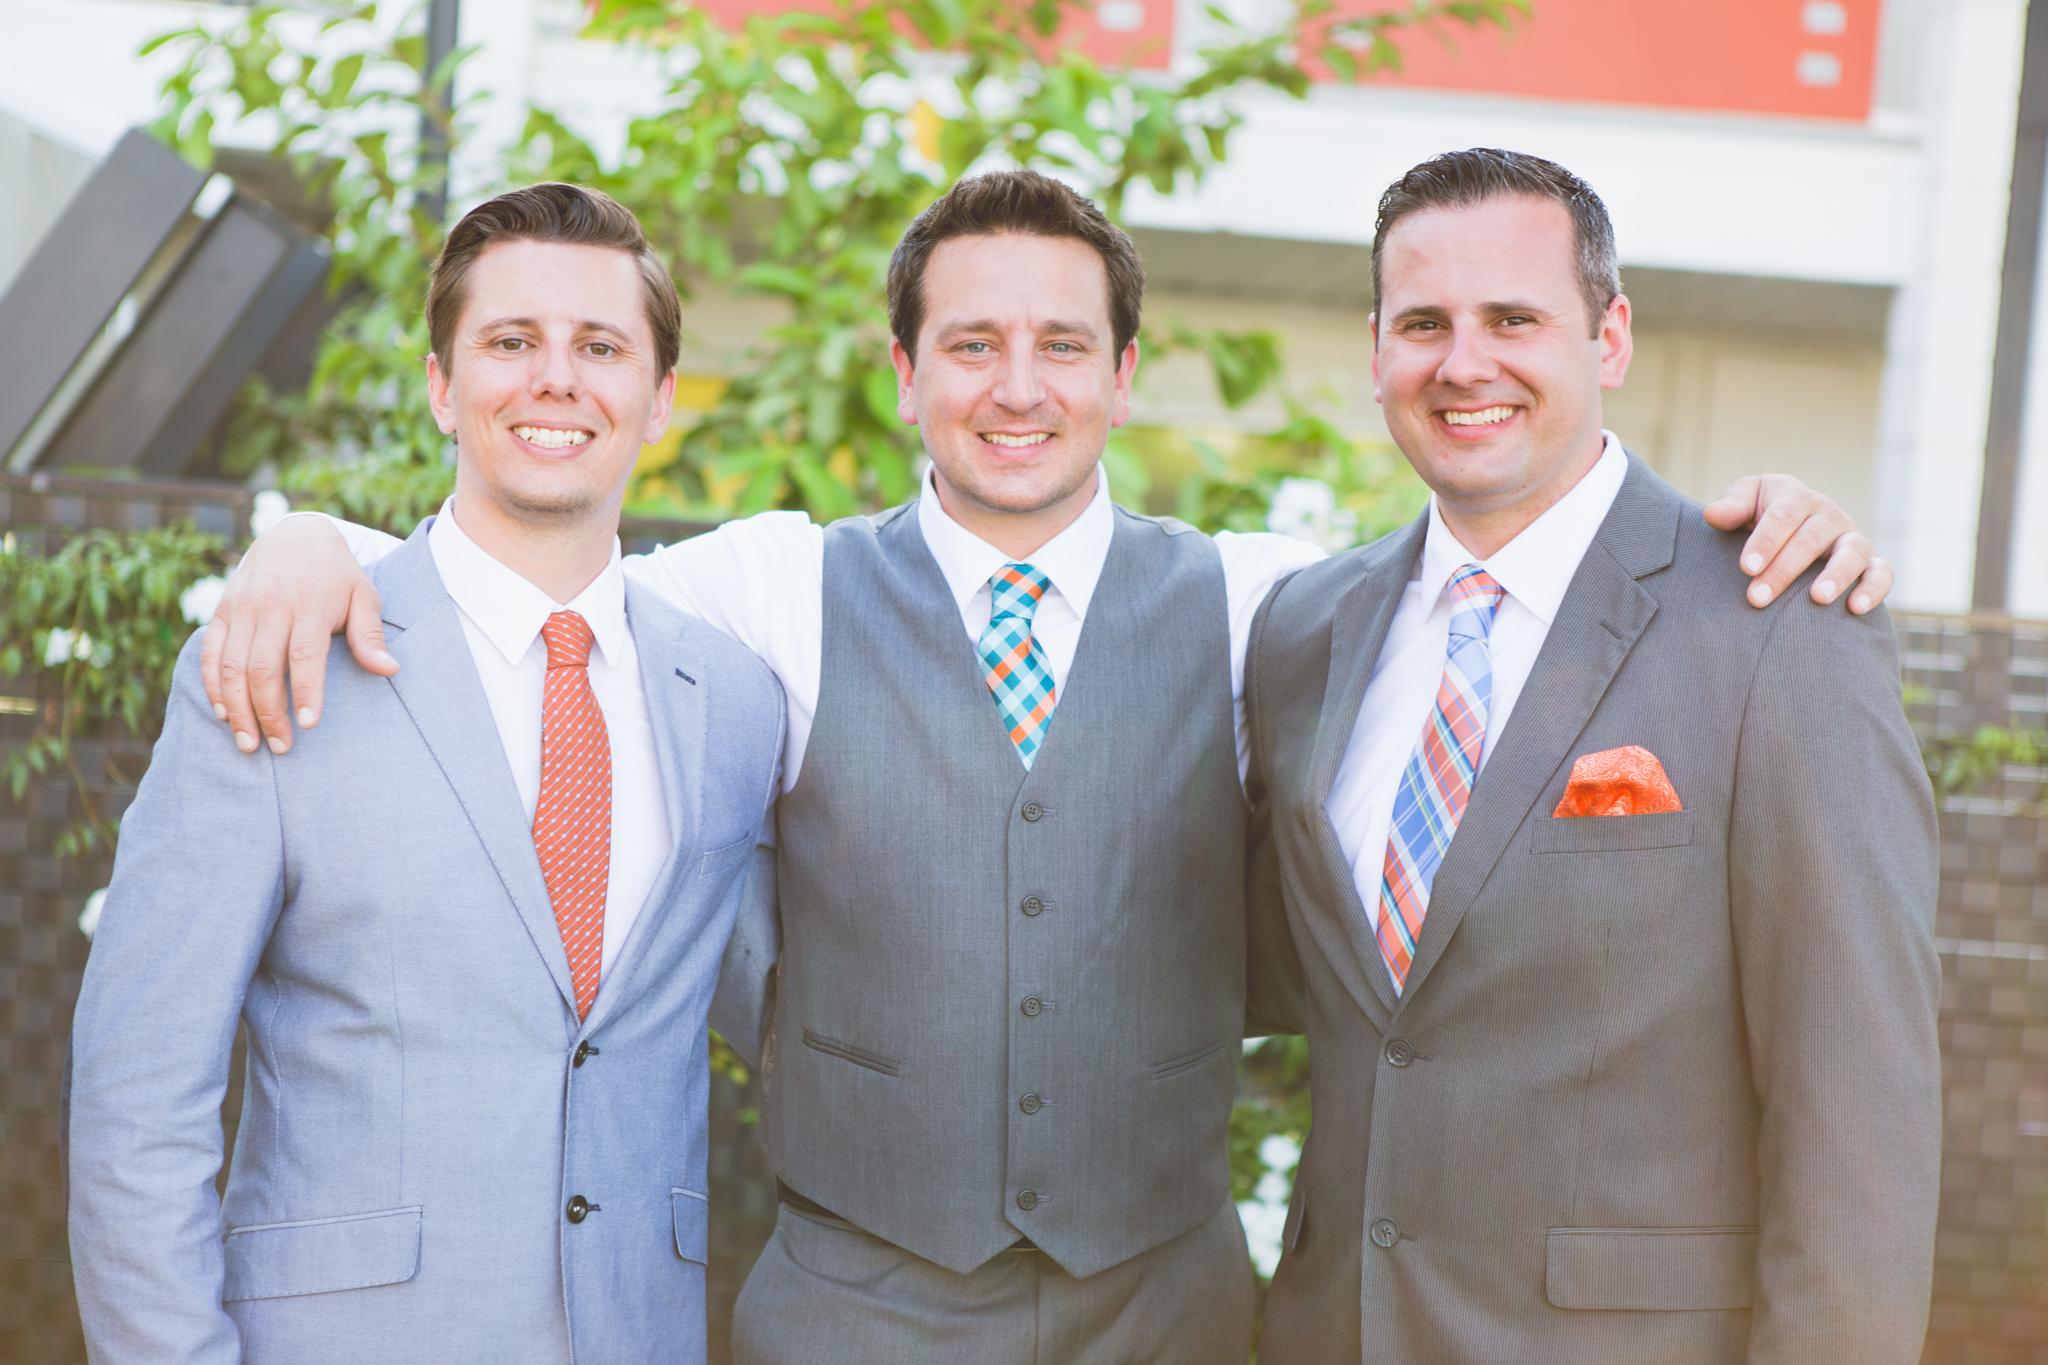 scottsdale-wedding-photographer-el-dorado-groom-brothers-smiling